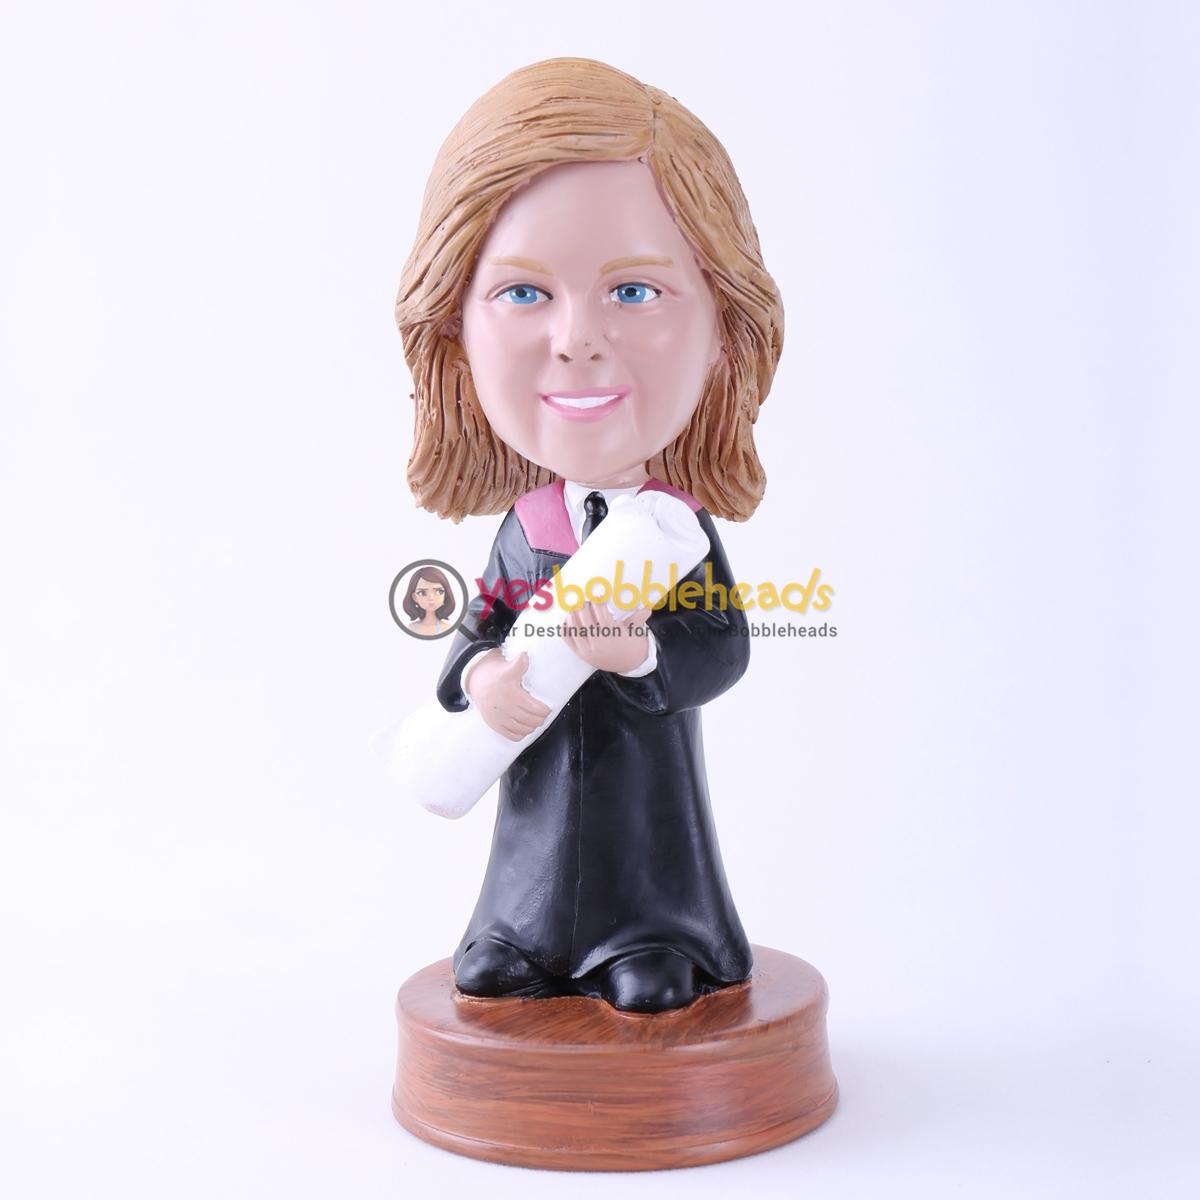 Picture of Custom Bobblehead Doll: Woman Graduation